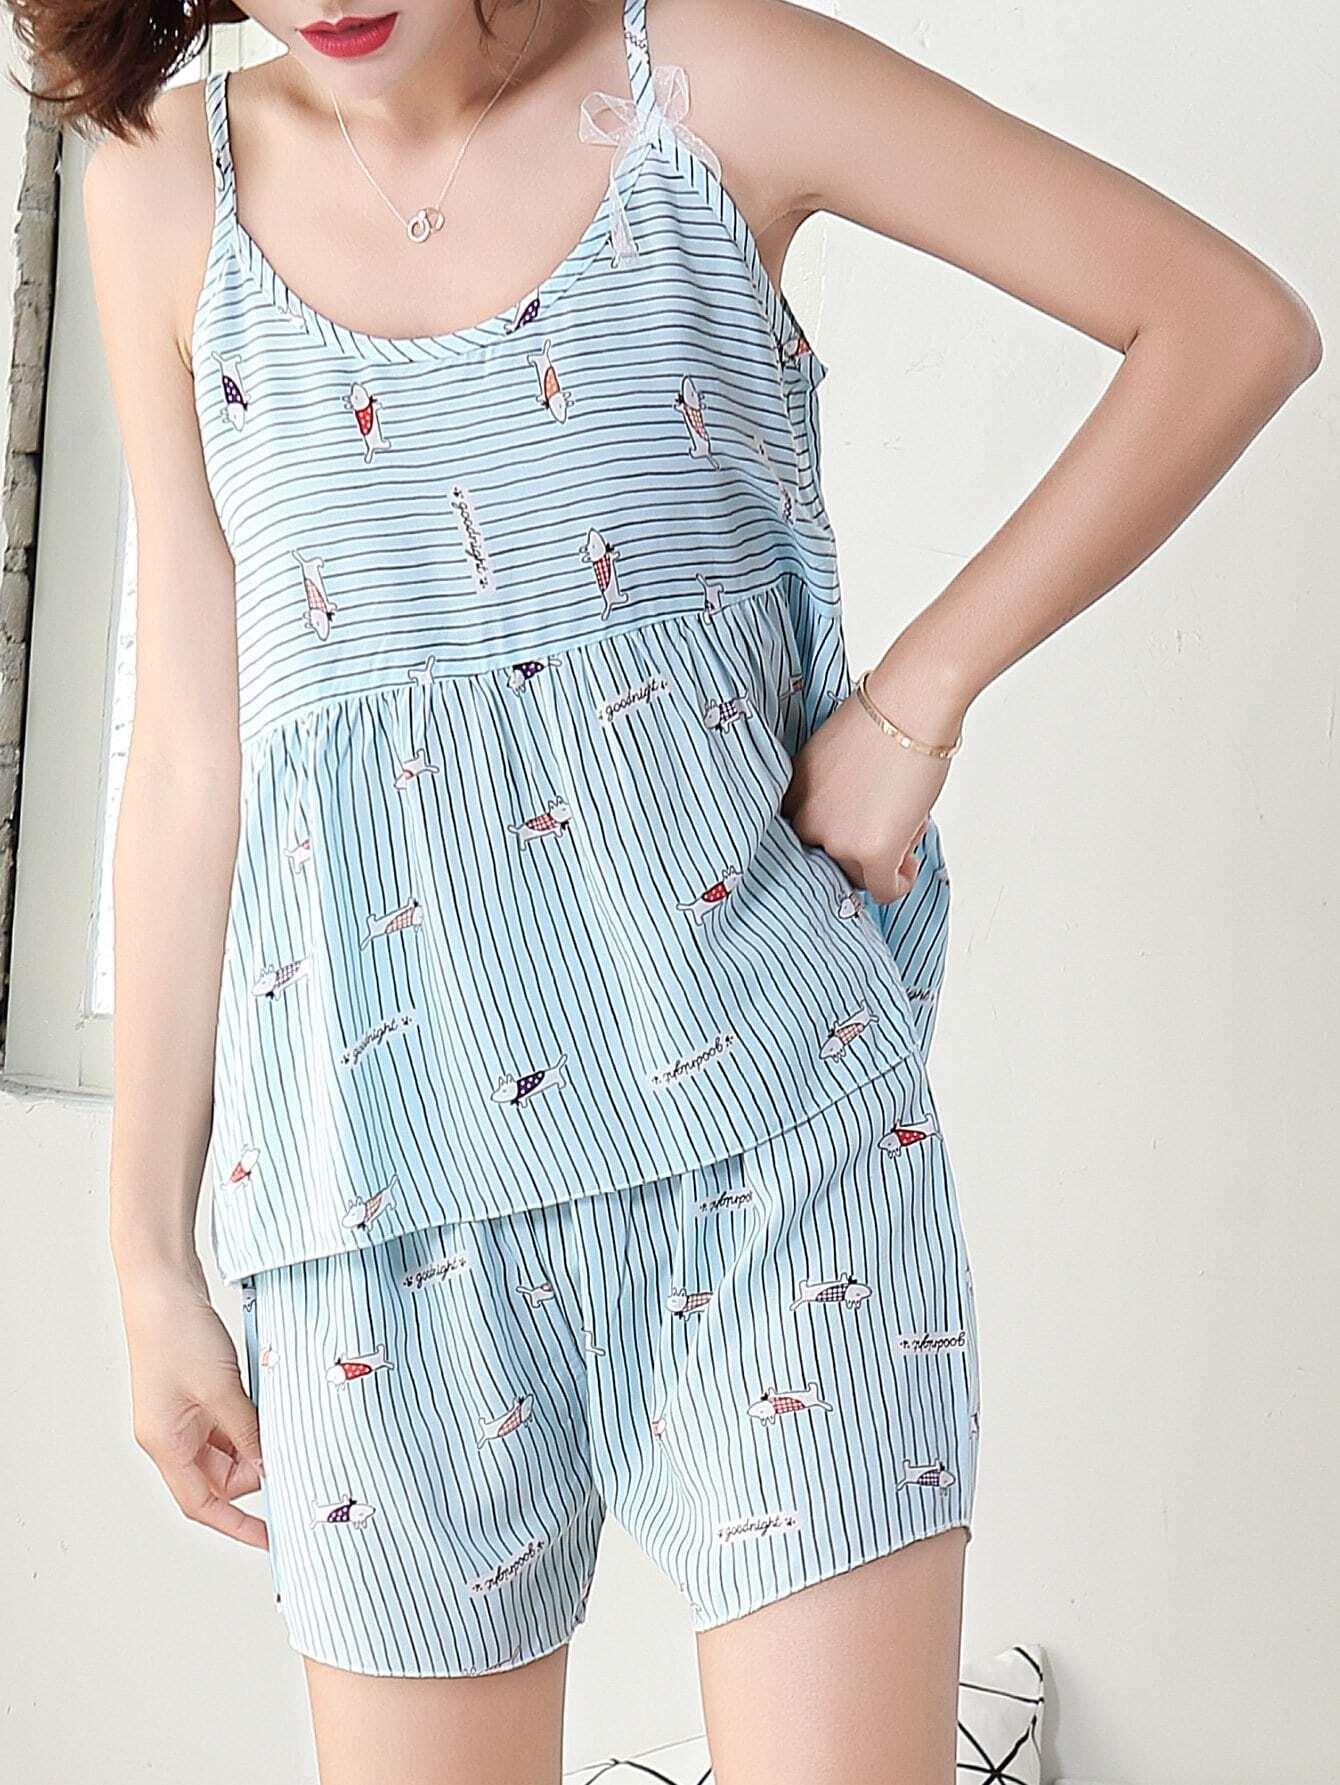 681ff58cff Dog Print Striped Cami Top & Shorts PJ Set | SHEIN